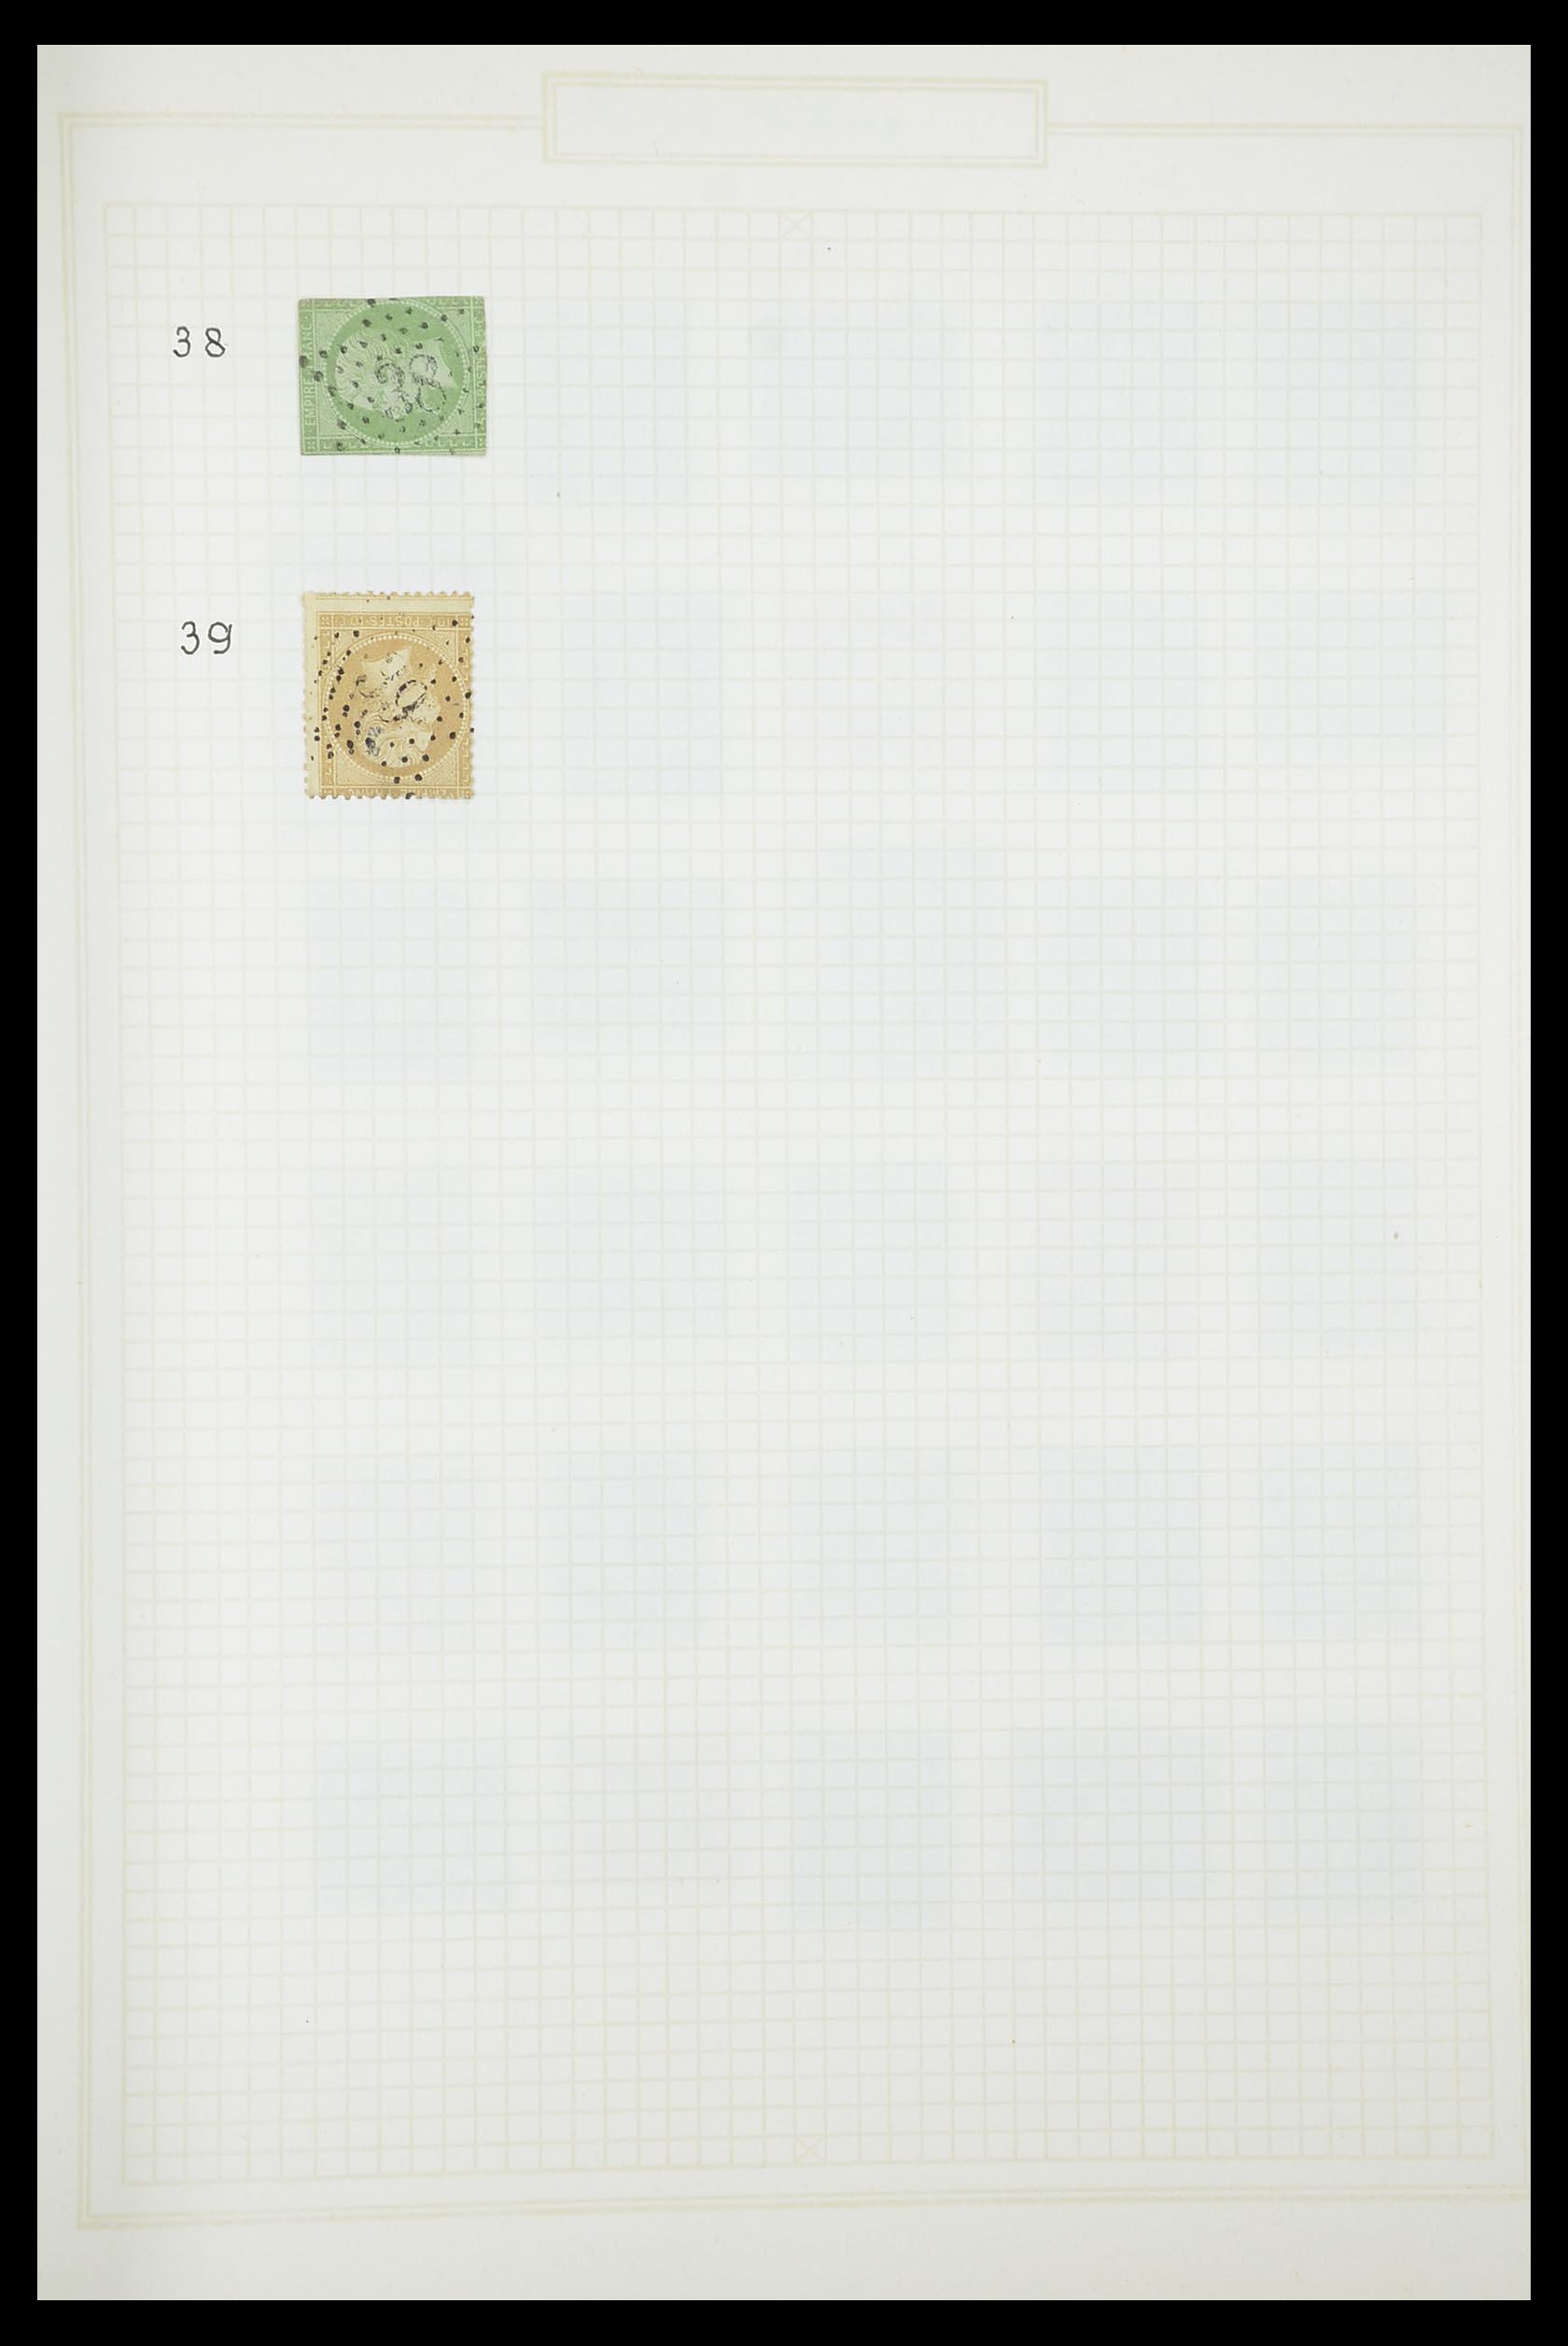 33851 008 - Postzegelverzameling 33851 Frankrijk klassiek stempels.